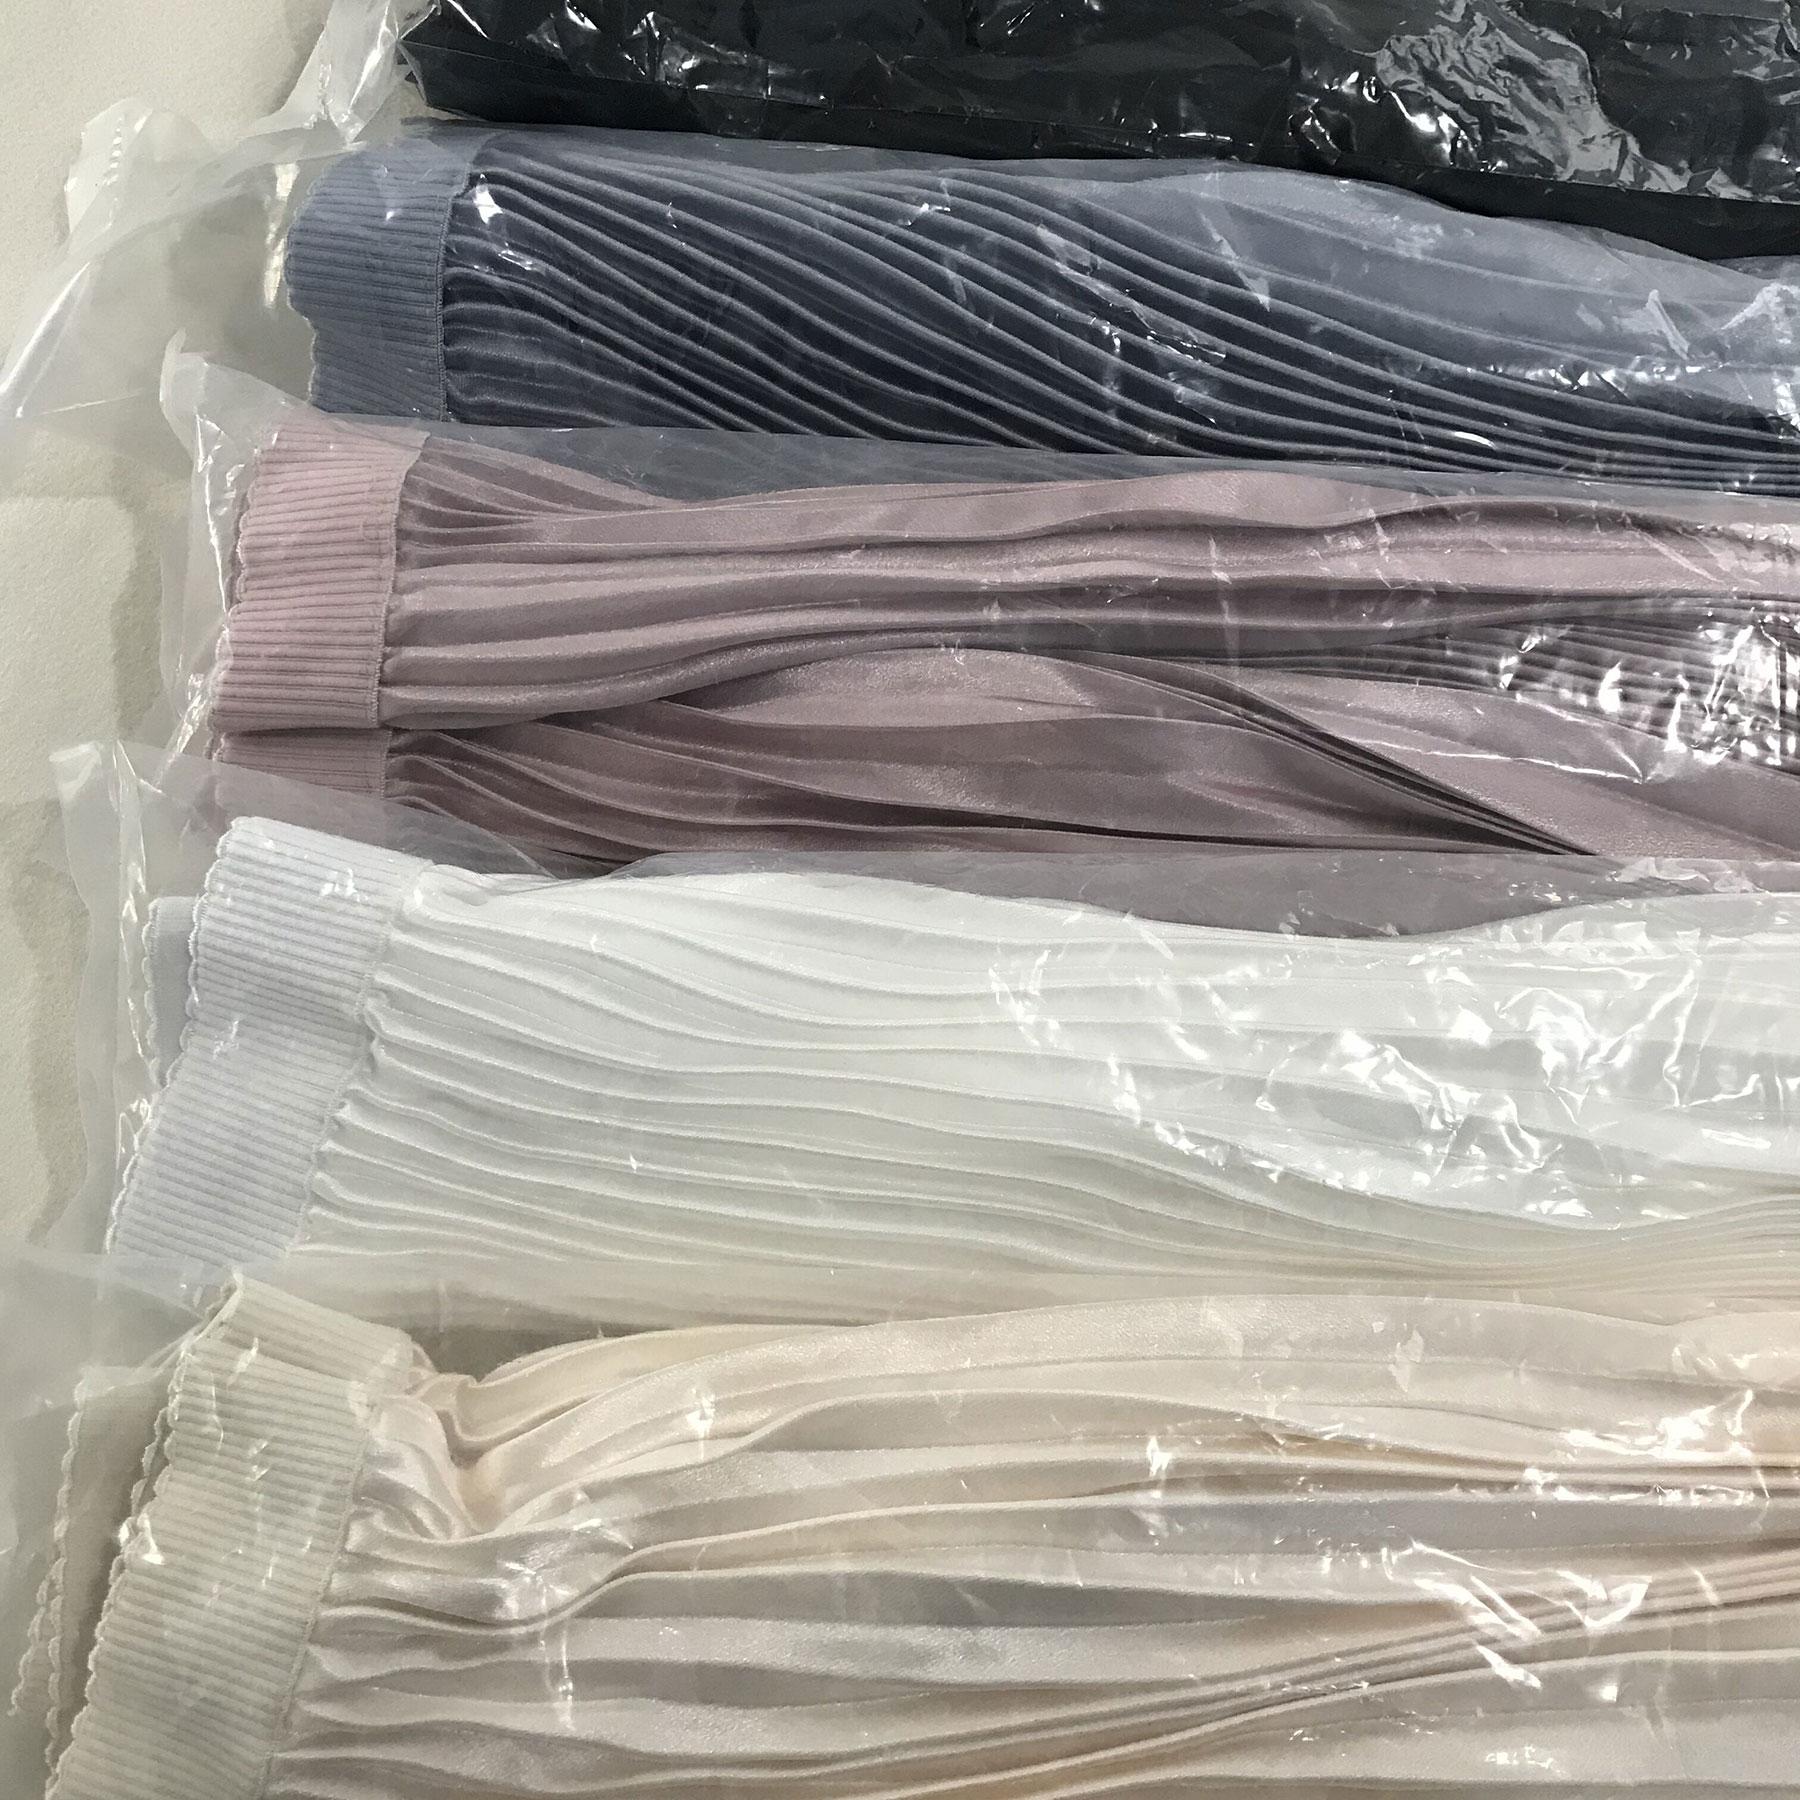 Sherhure 2018 Spring Women Long Skirts Fashion Brand A-Line Women Pleated Skirts High Waist Women Midi Skirt Faldas Mujer Saias 9